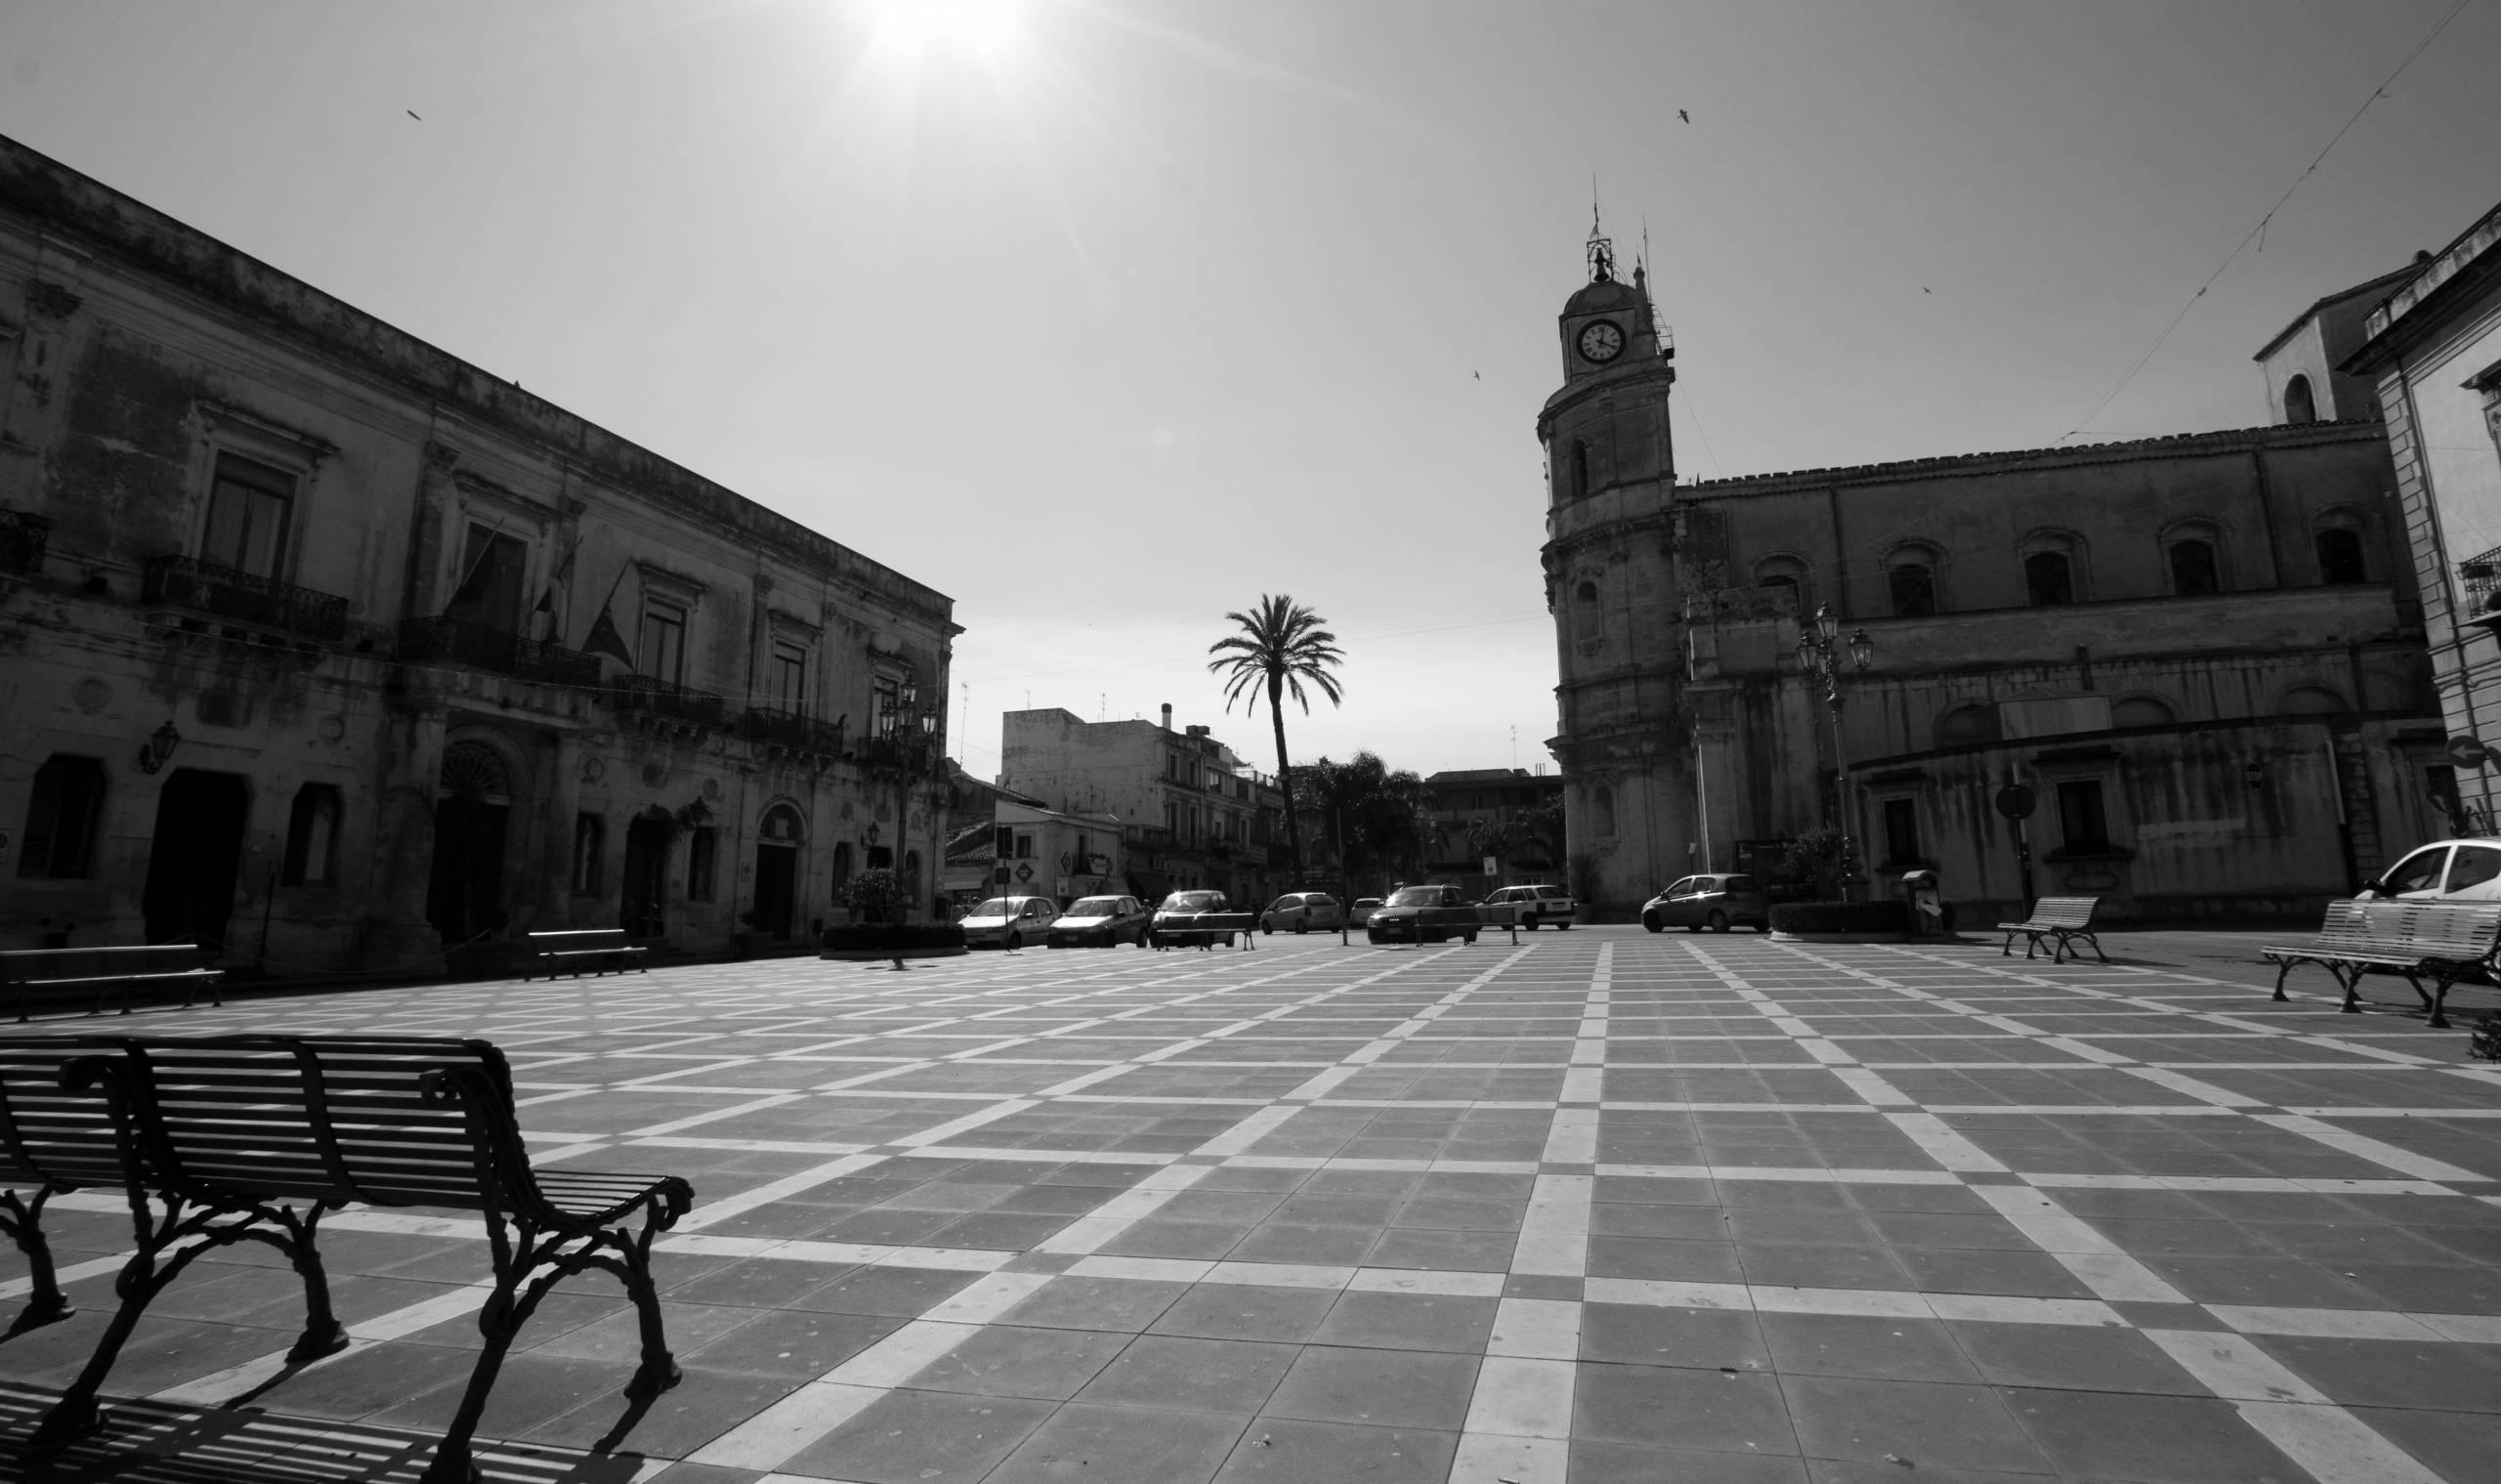 Floridia historic center square